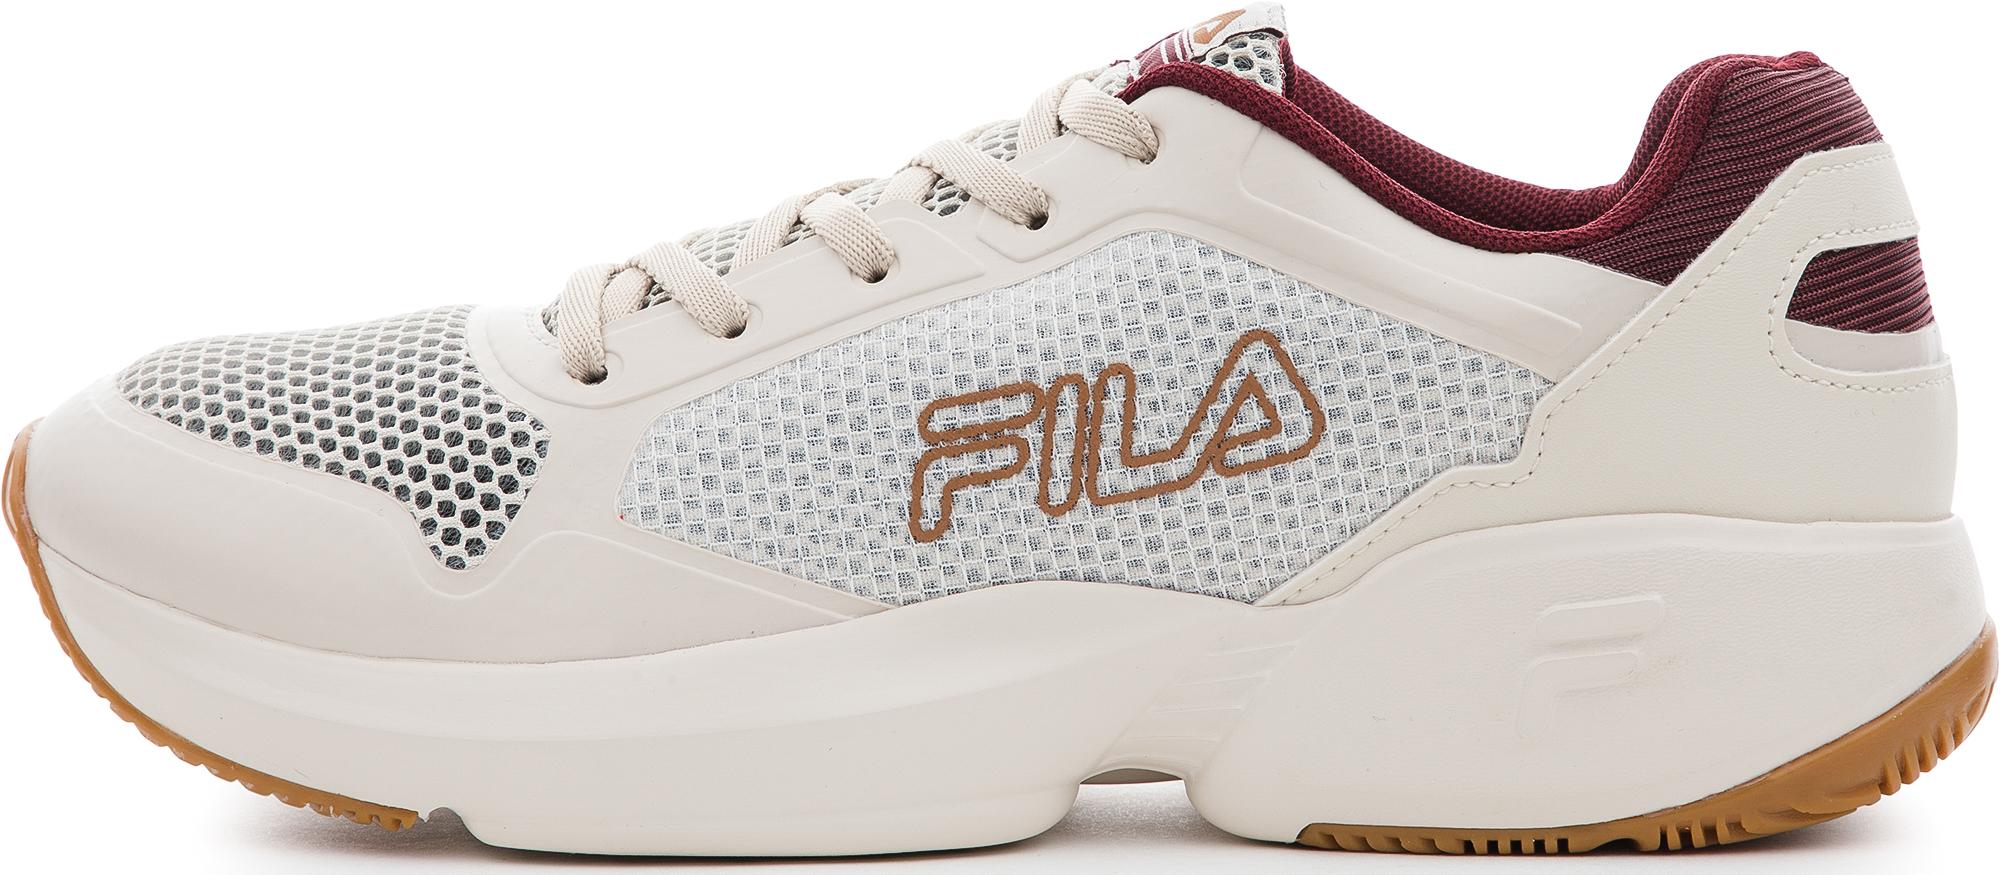 Fila Кроссовки мужские Fila Extra Jog, размер 41 цена 2017